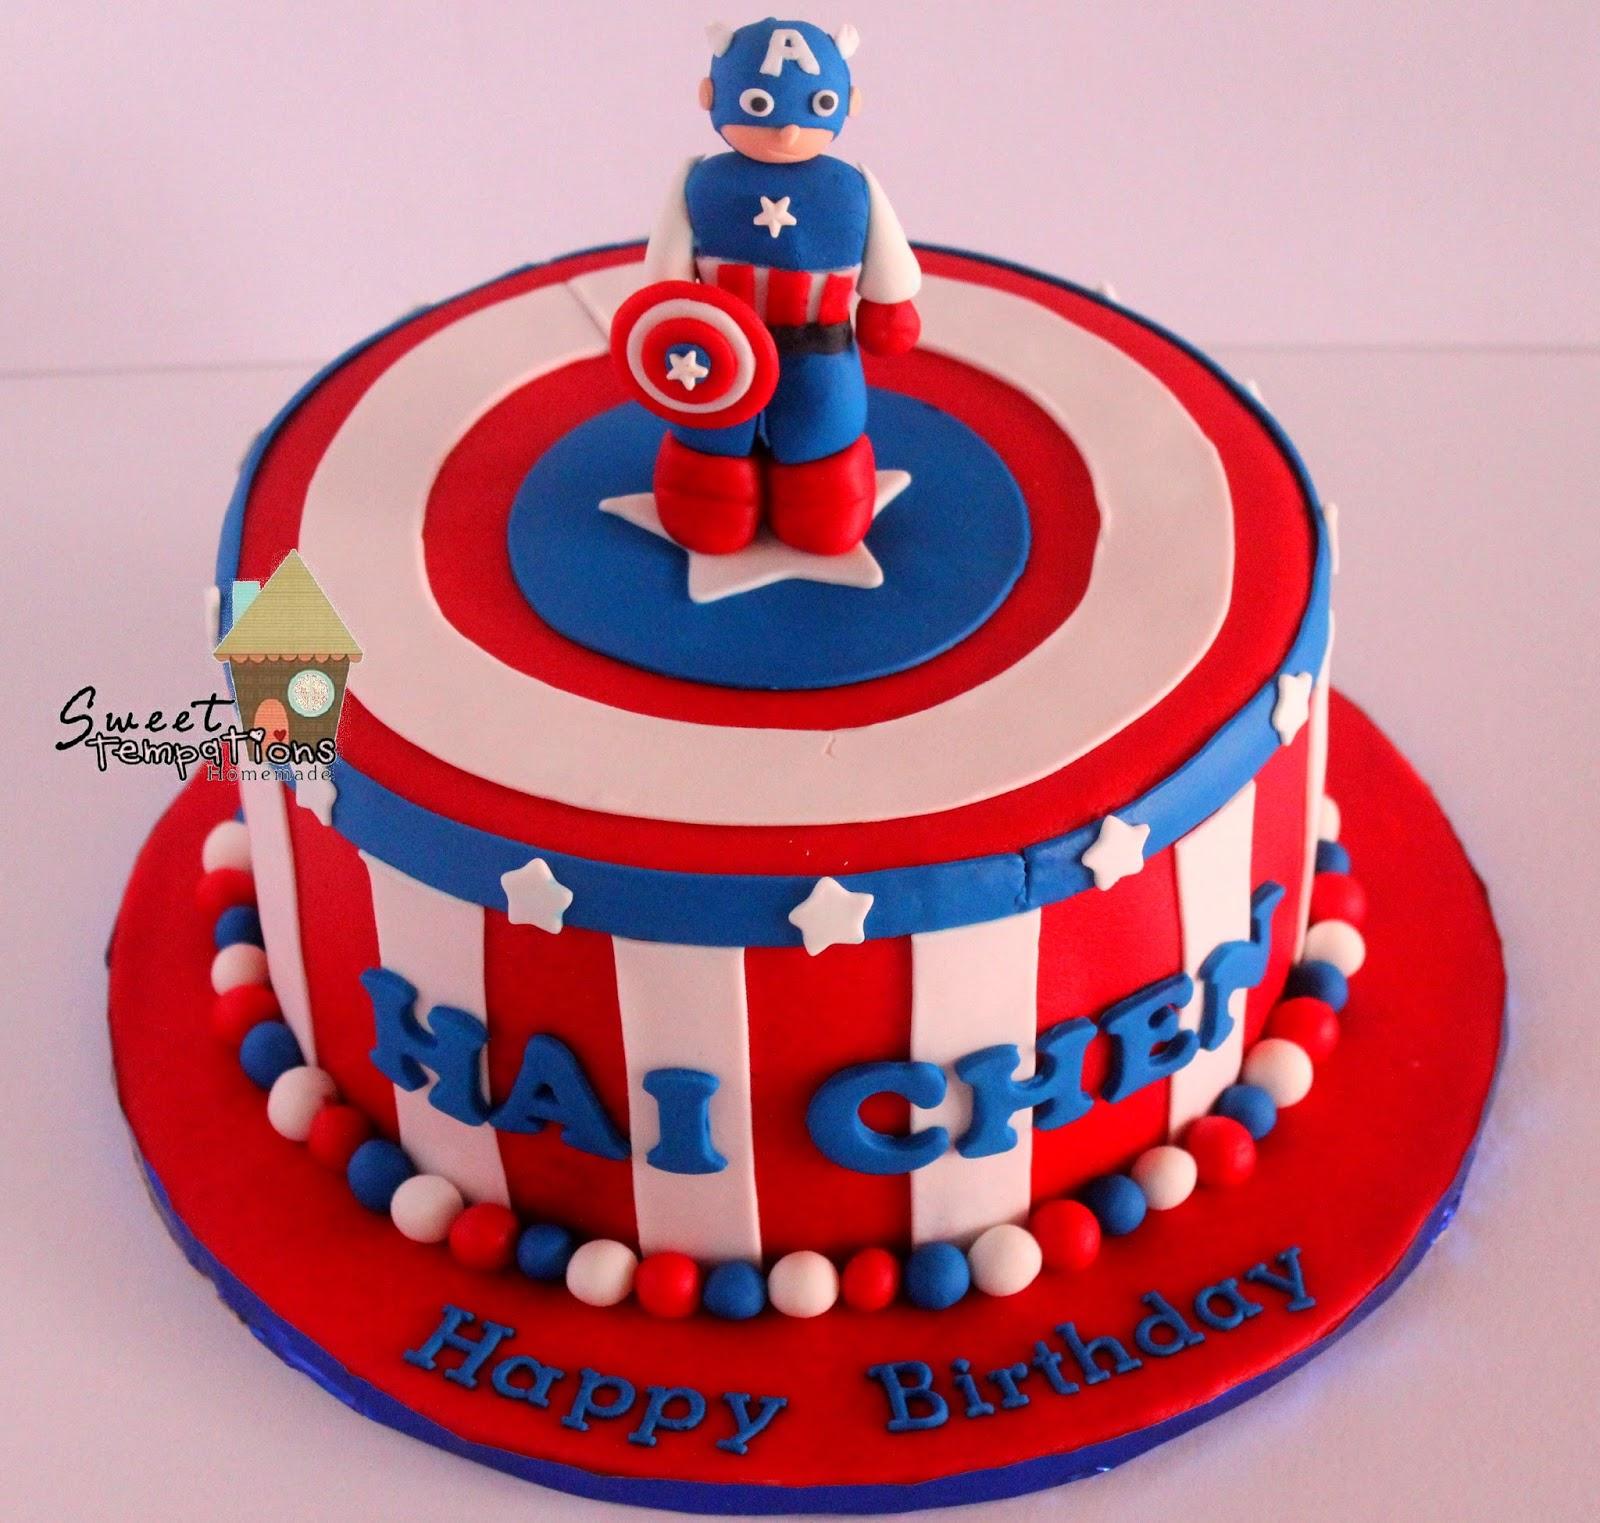 Sweet Temptations Homemade Cakes Amp Pastry Avengers